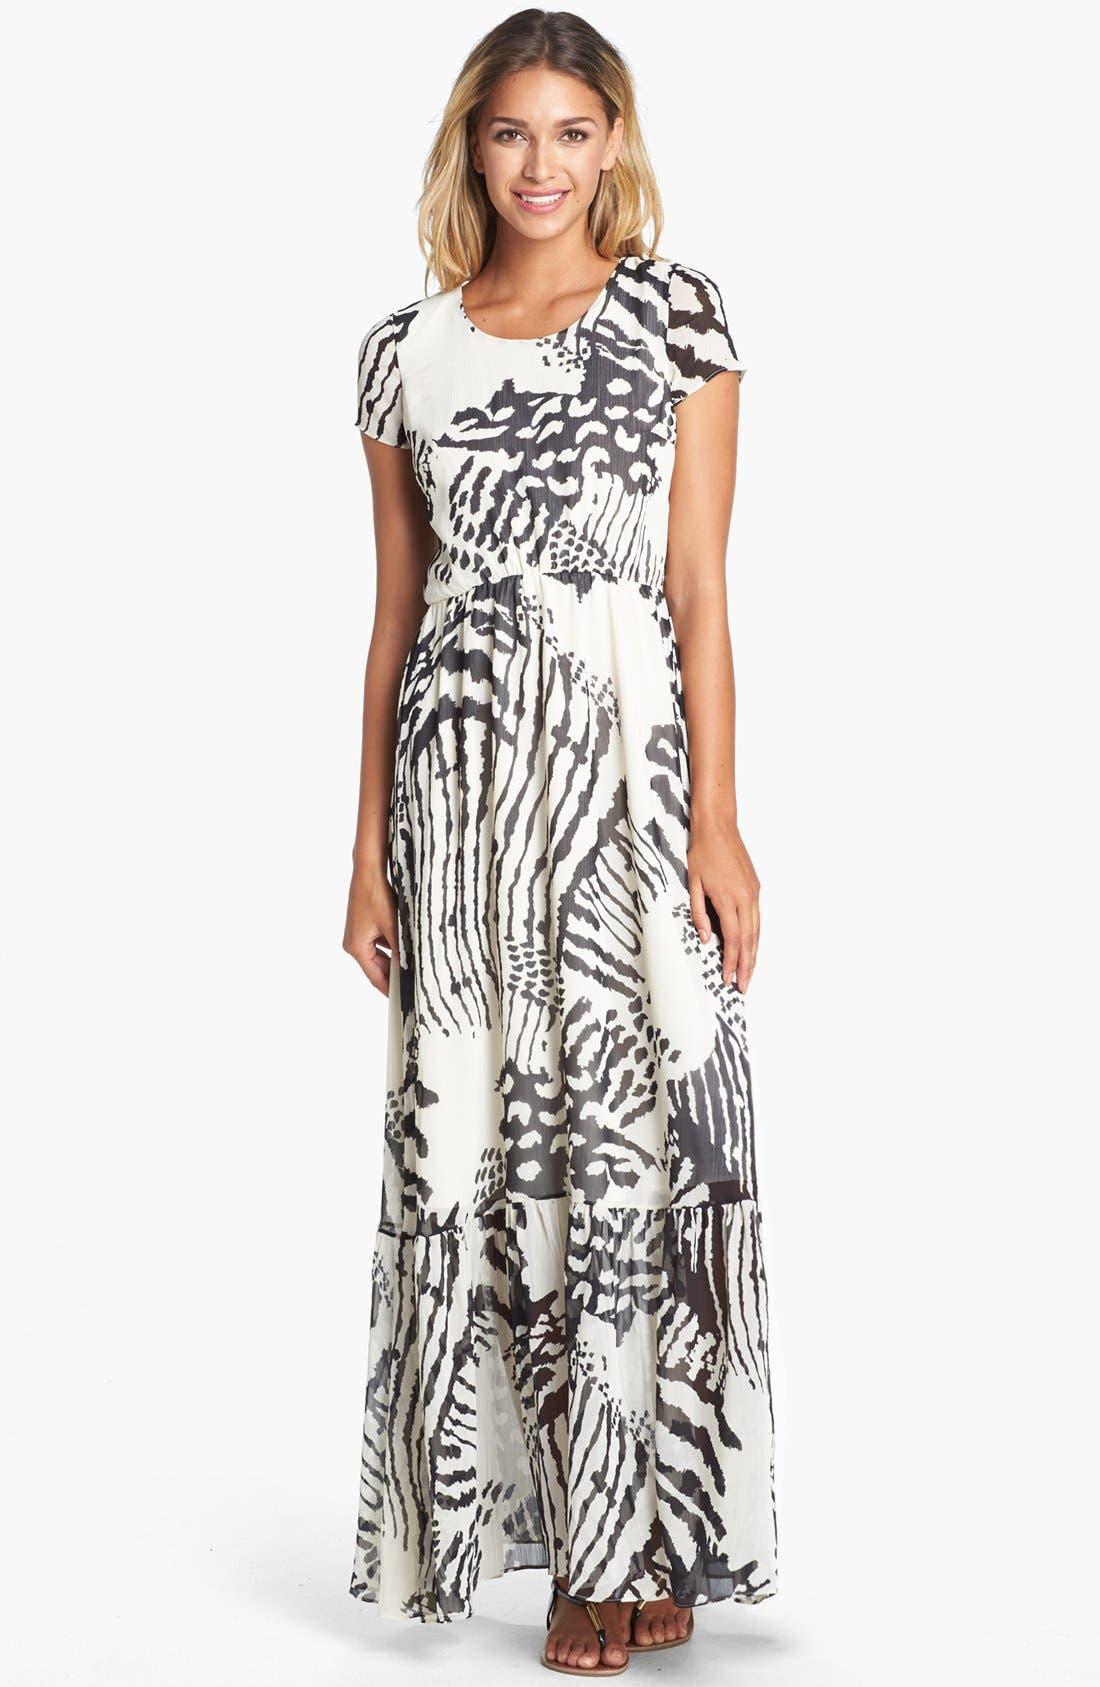 Alternate Image 1 Selected - Dress the Population 'Reese' Print Crepe Maxi Dress